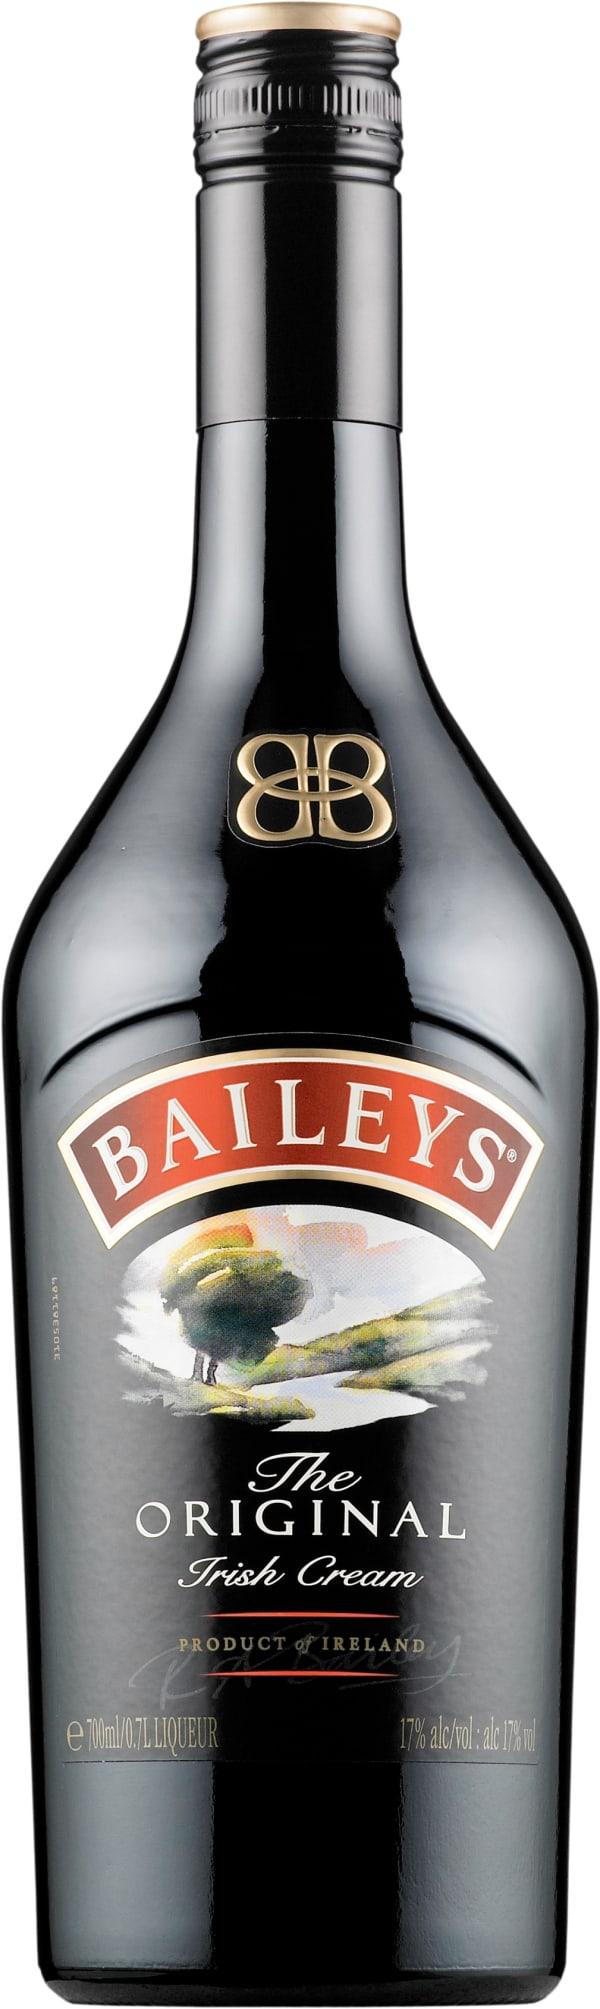 Ubrugte Baileys Original Irish Cream | Alko PD-36